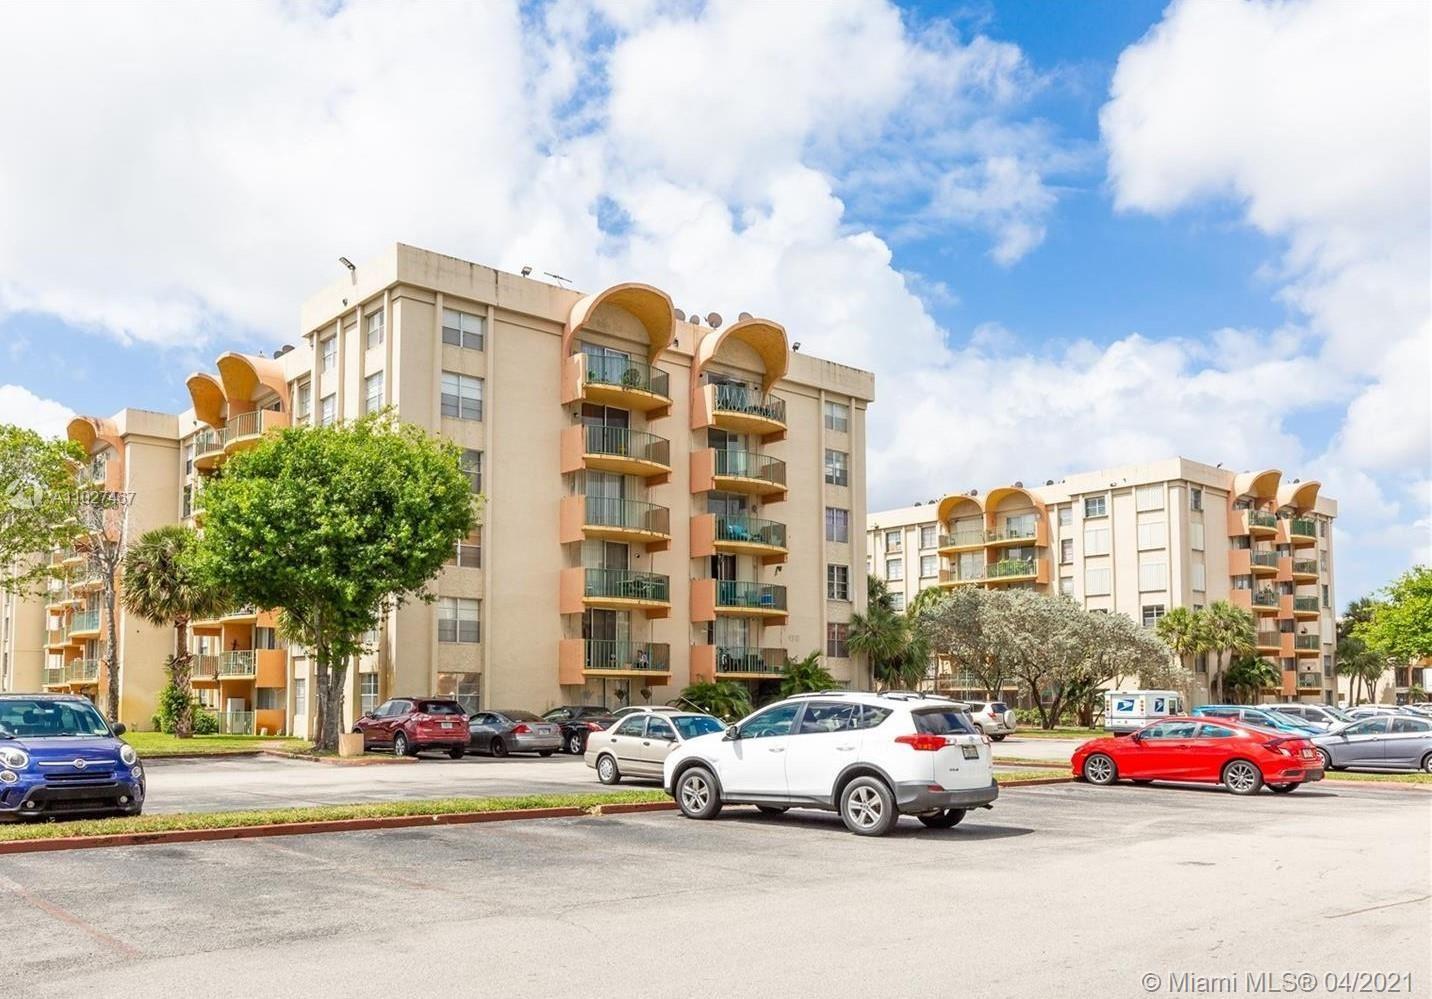 9310 Fontainebleau Blvd #610, Miami, FL 33172 - #: A11027467